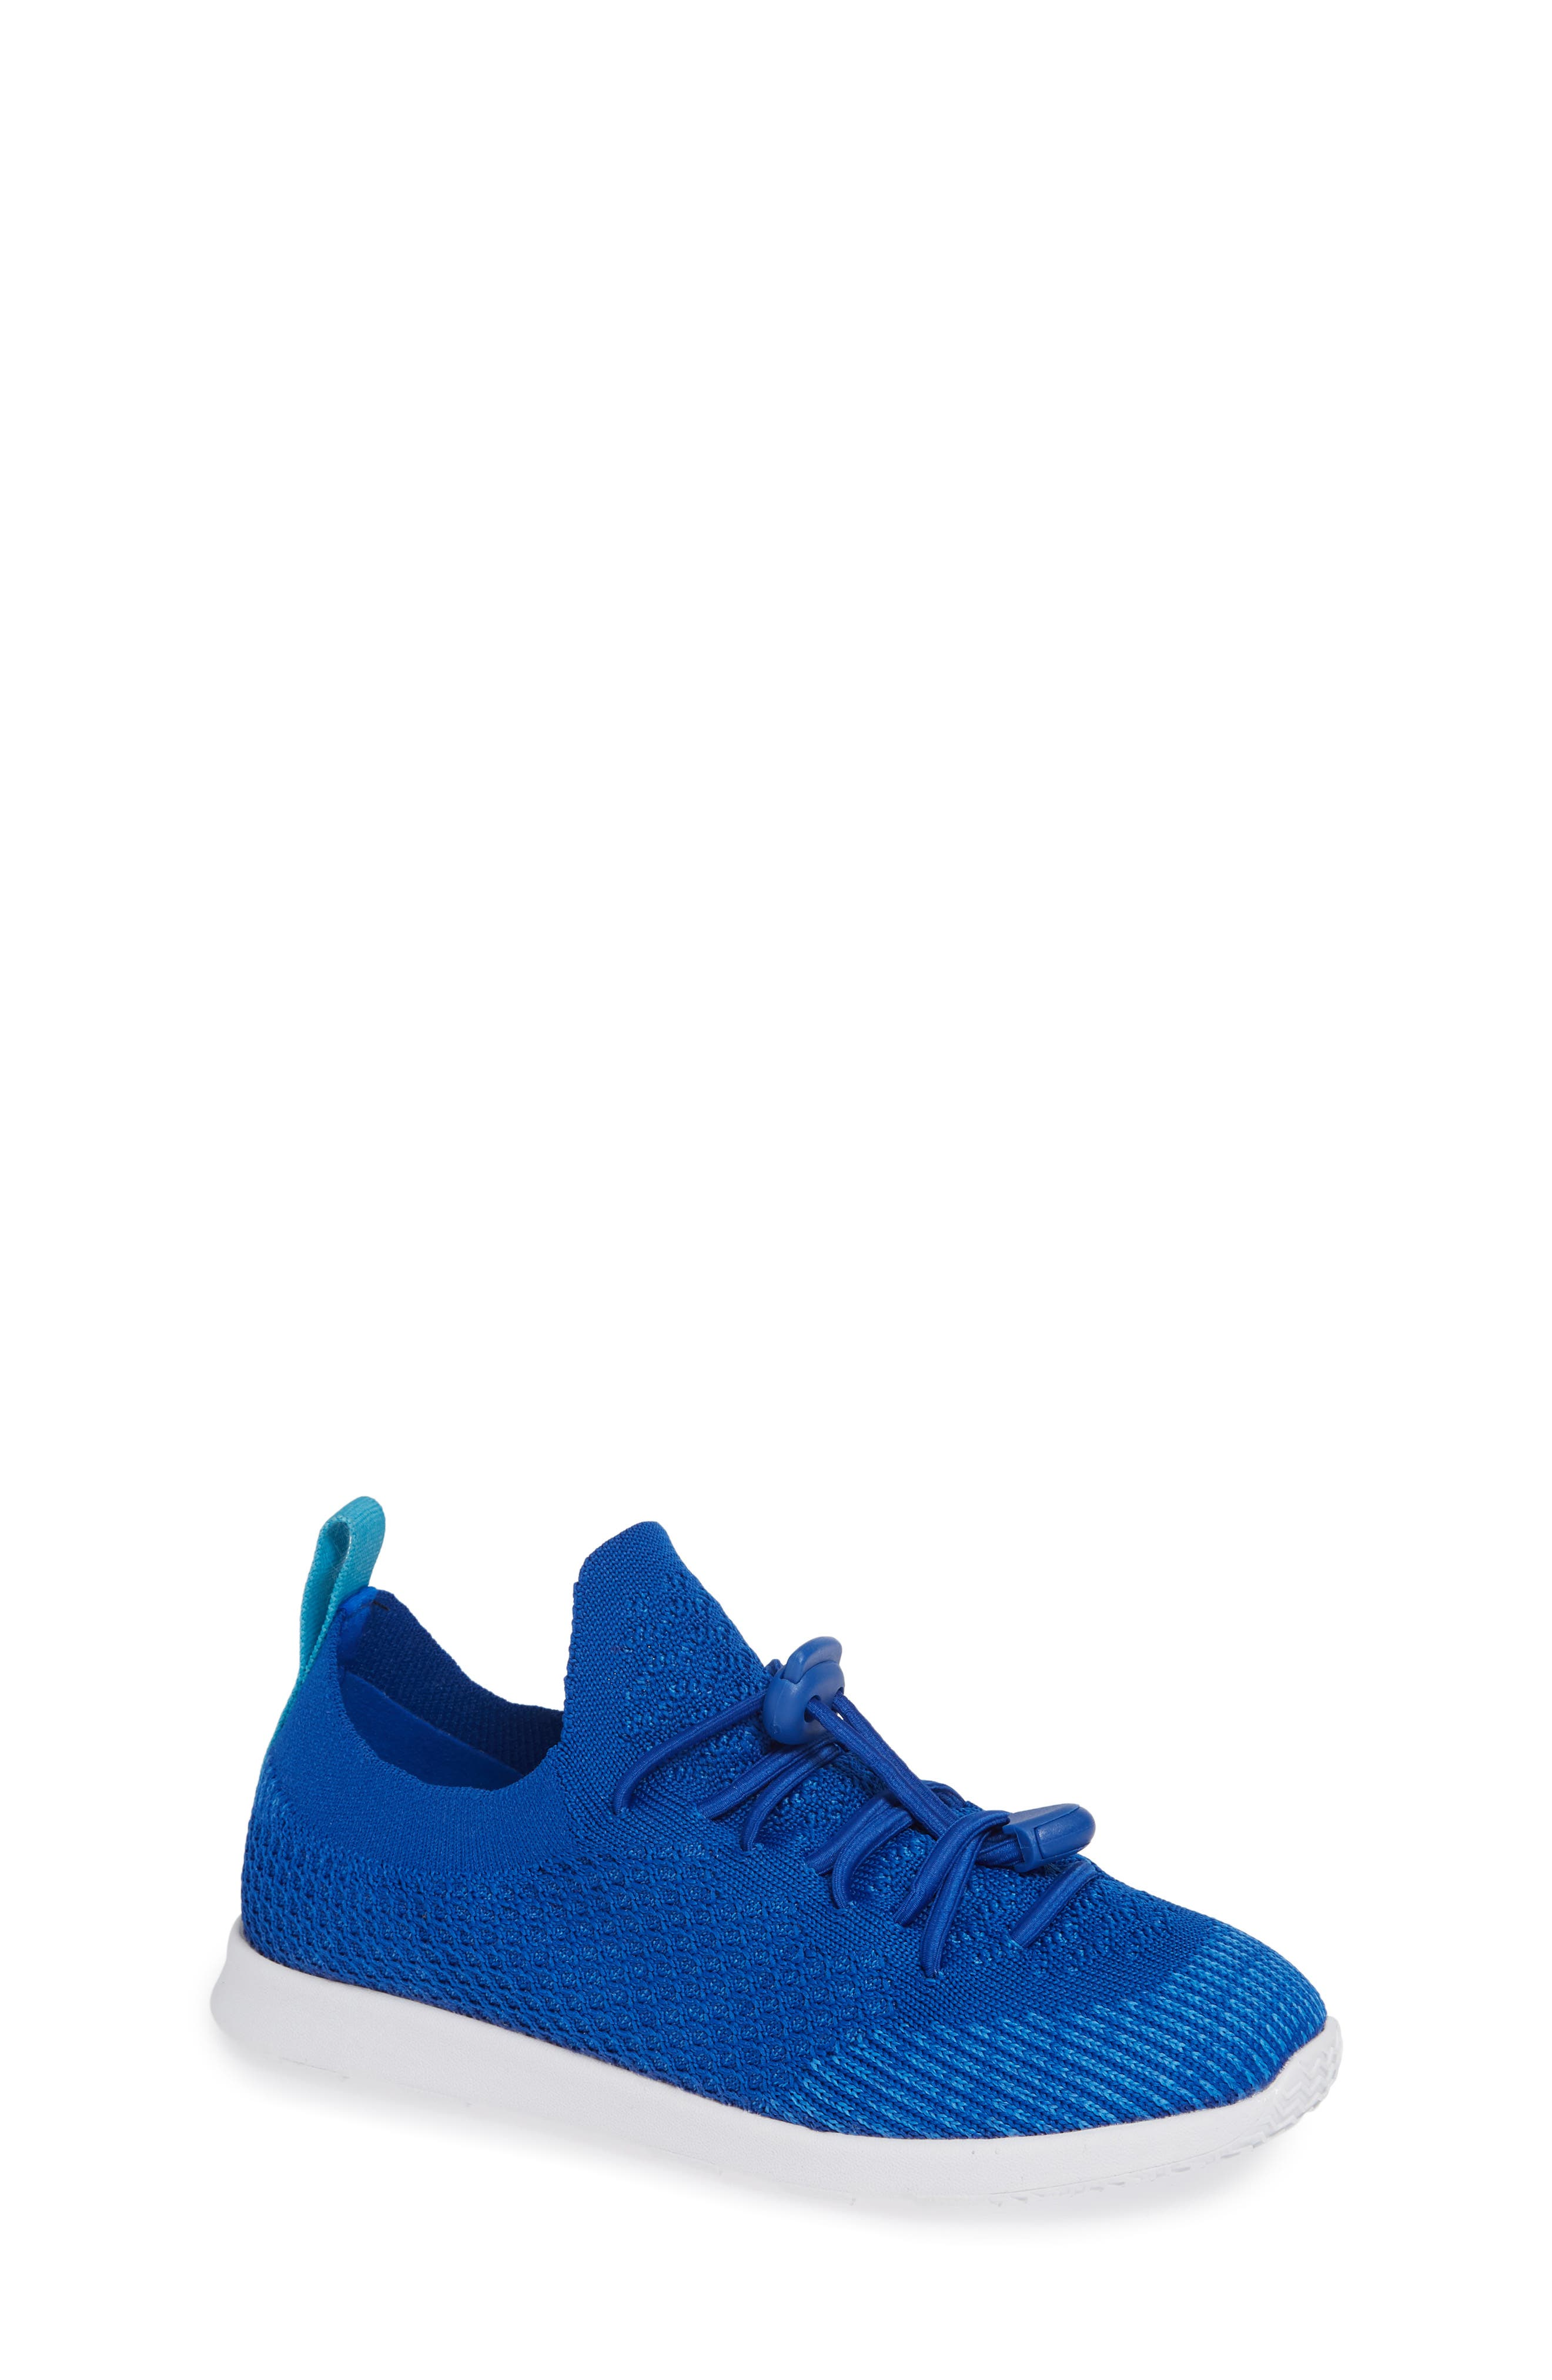 AP Mercury LiteKnit Sneaker,                         Main,                         color, VICTORIA BLUE/ SHELL WHITE